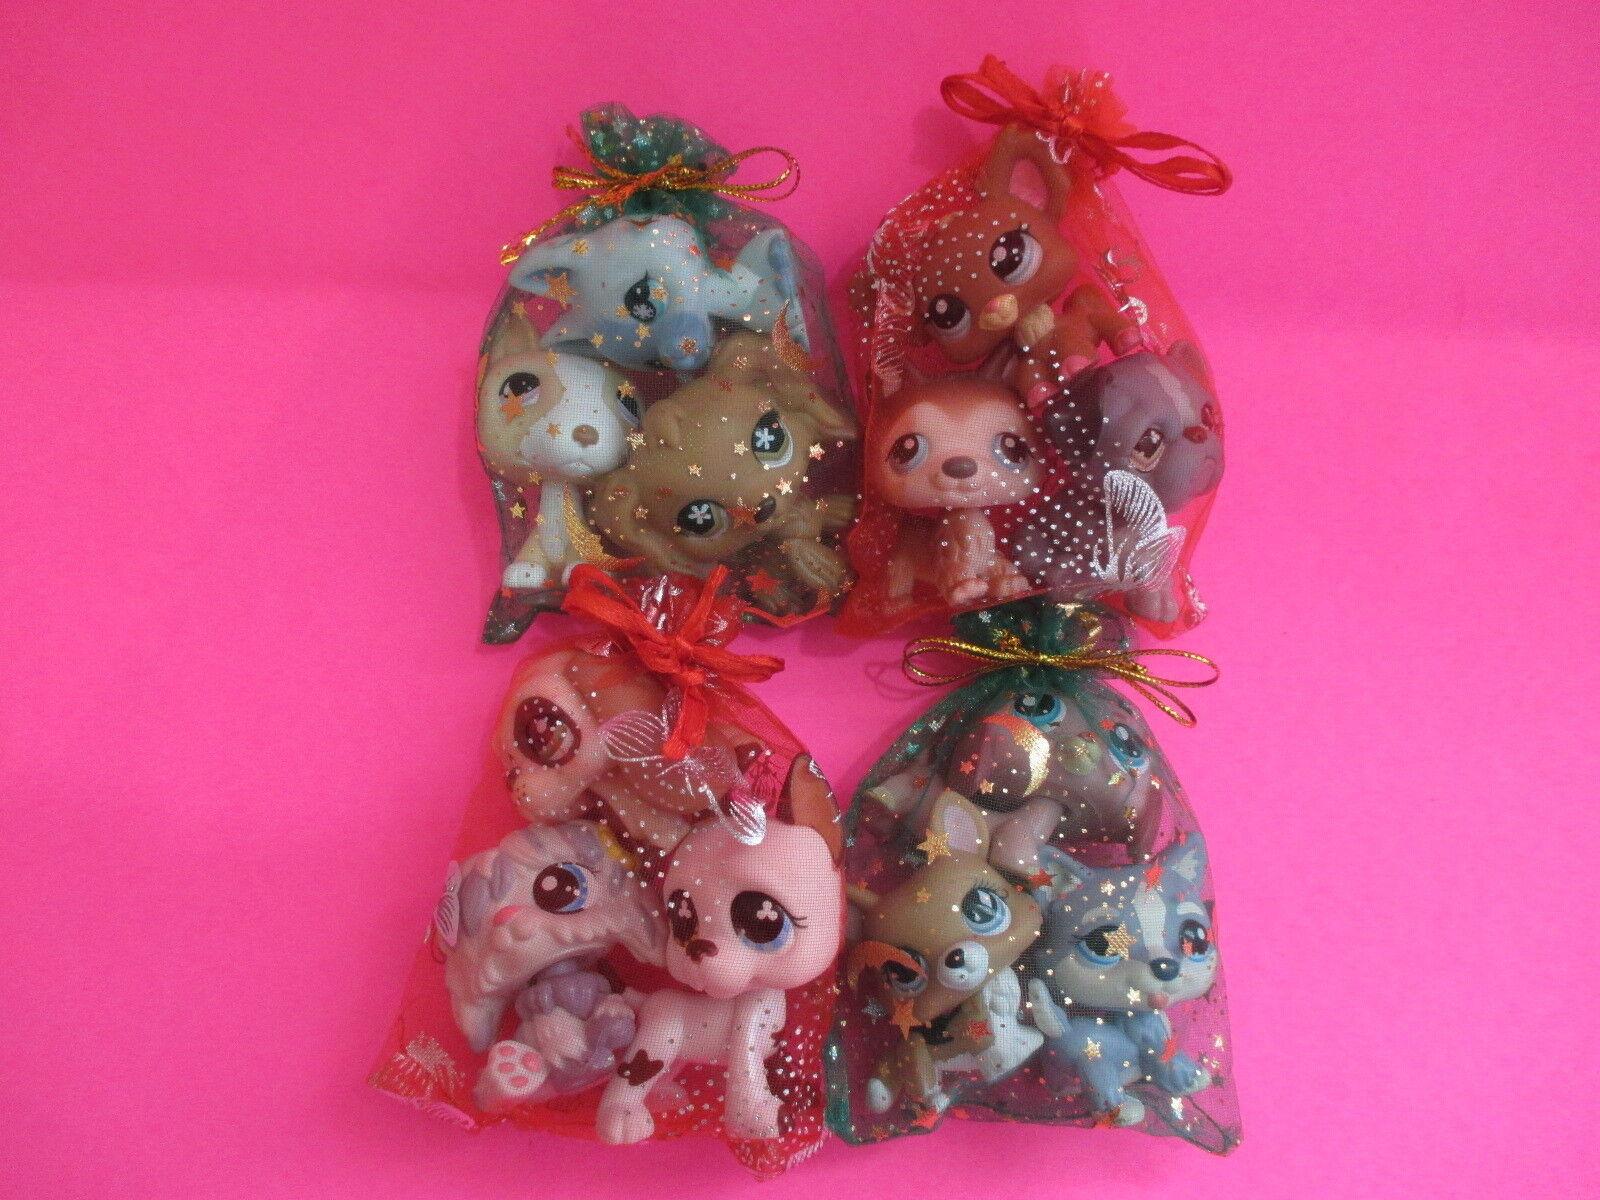 Купить Littlest Pet Shop LOT of 3 RANDOM Surprise Puppy Dogs! 100% Authentic